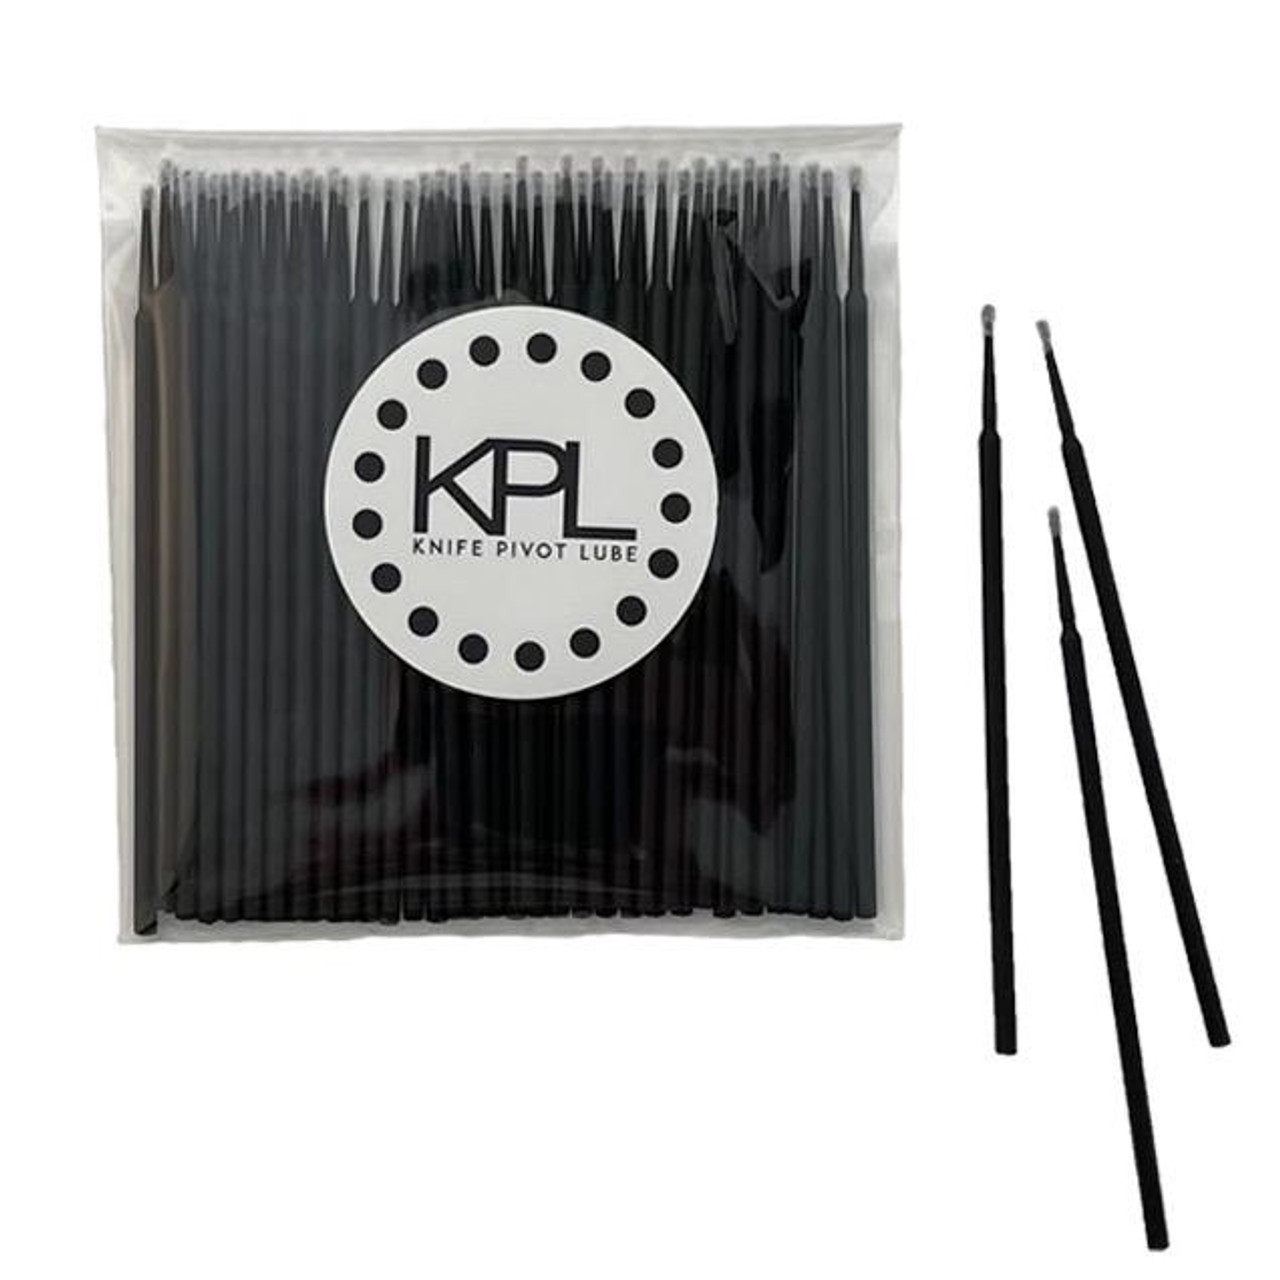 KPL Ultra-Micro Swabs -50ct